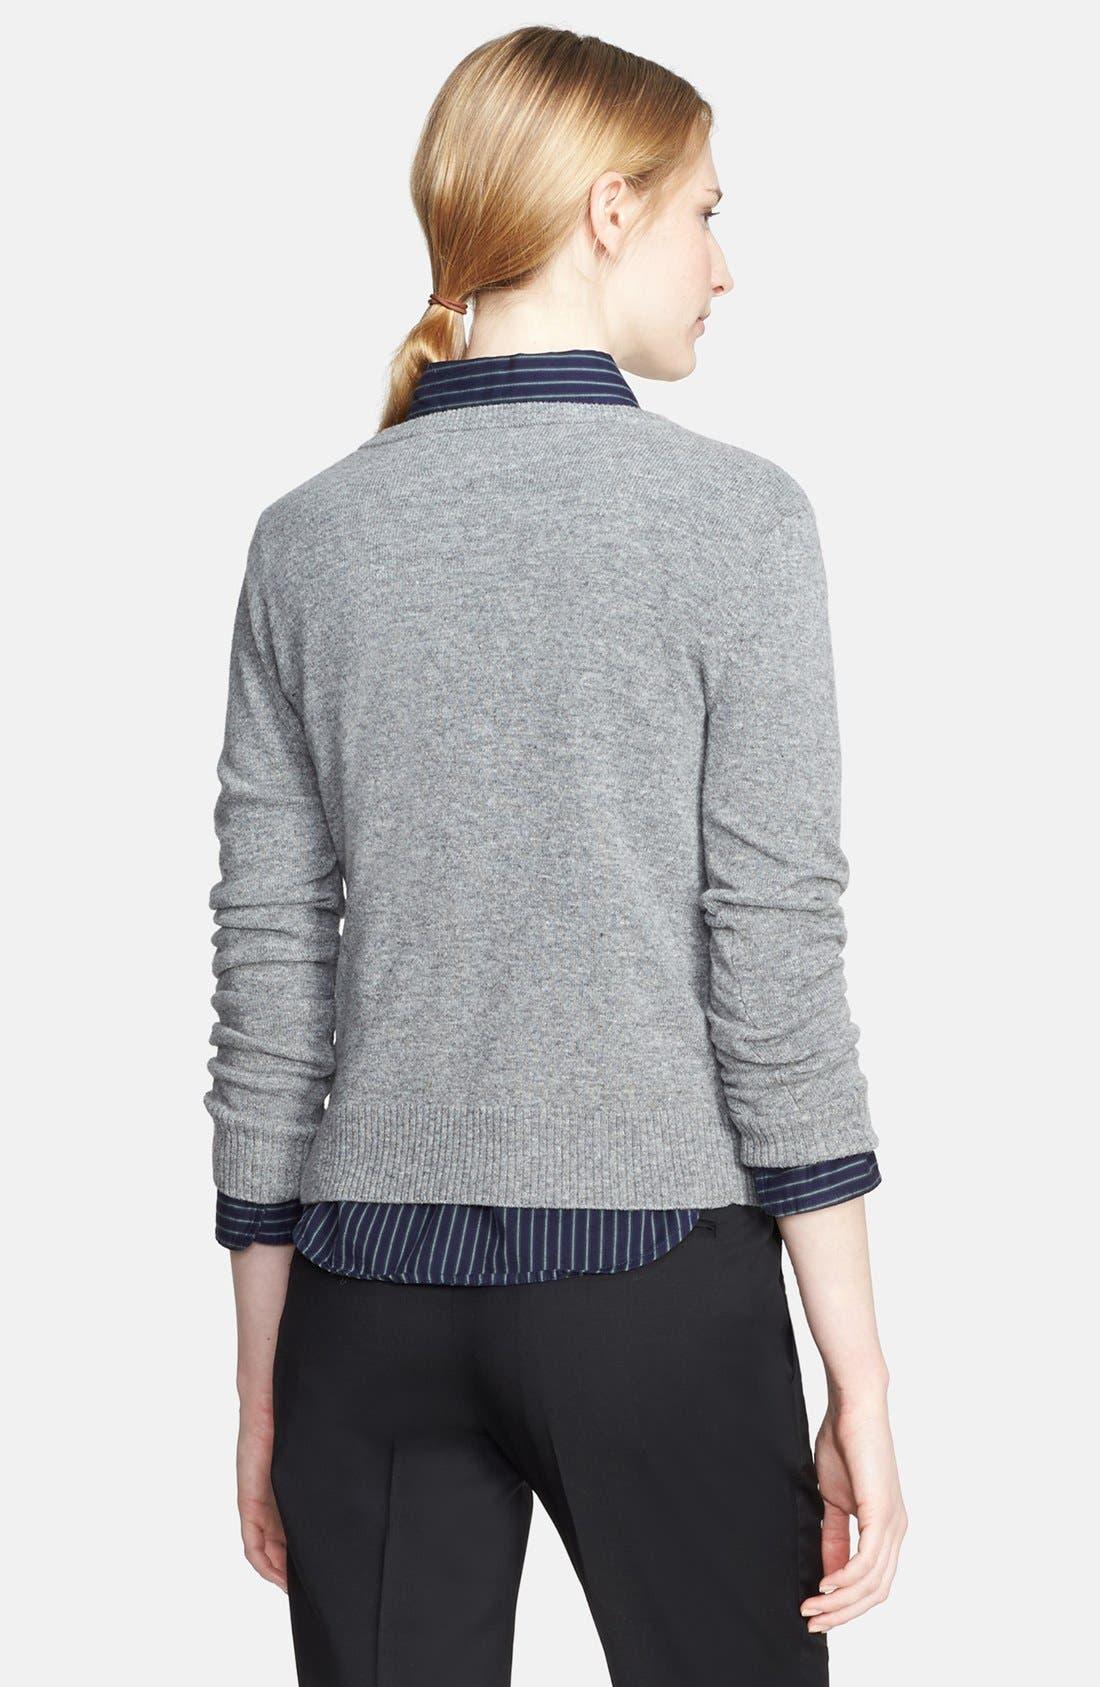 Eyelash Felted Wool Sweater,                             Alternate thumbnail 2, color,                             066